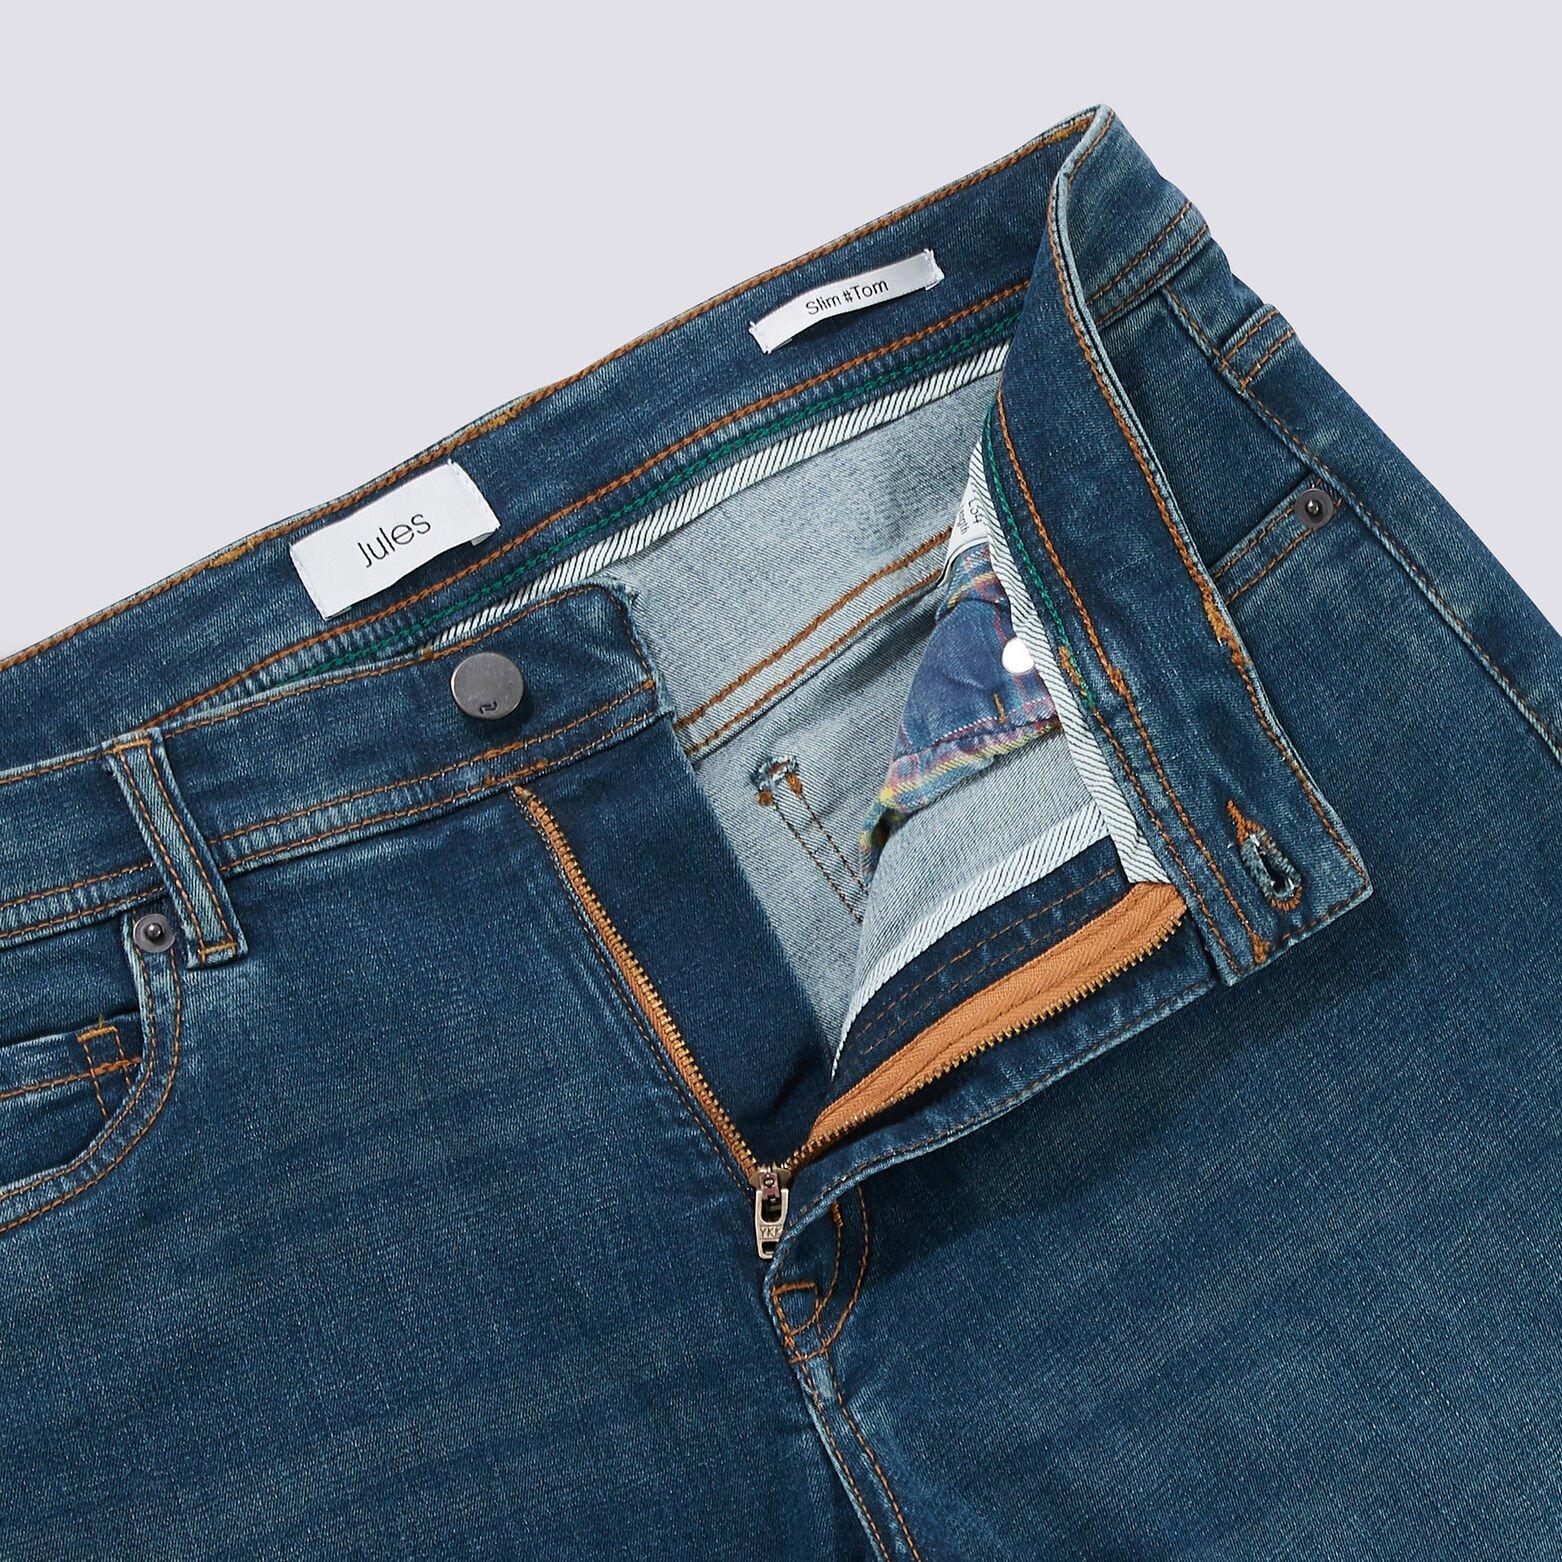 Jean slim #Tom urbanflex 4 longueurs greencast